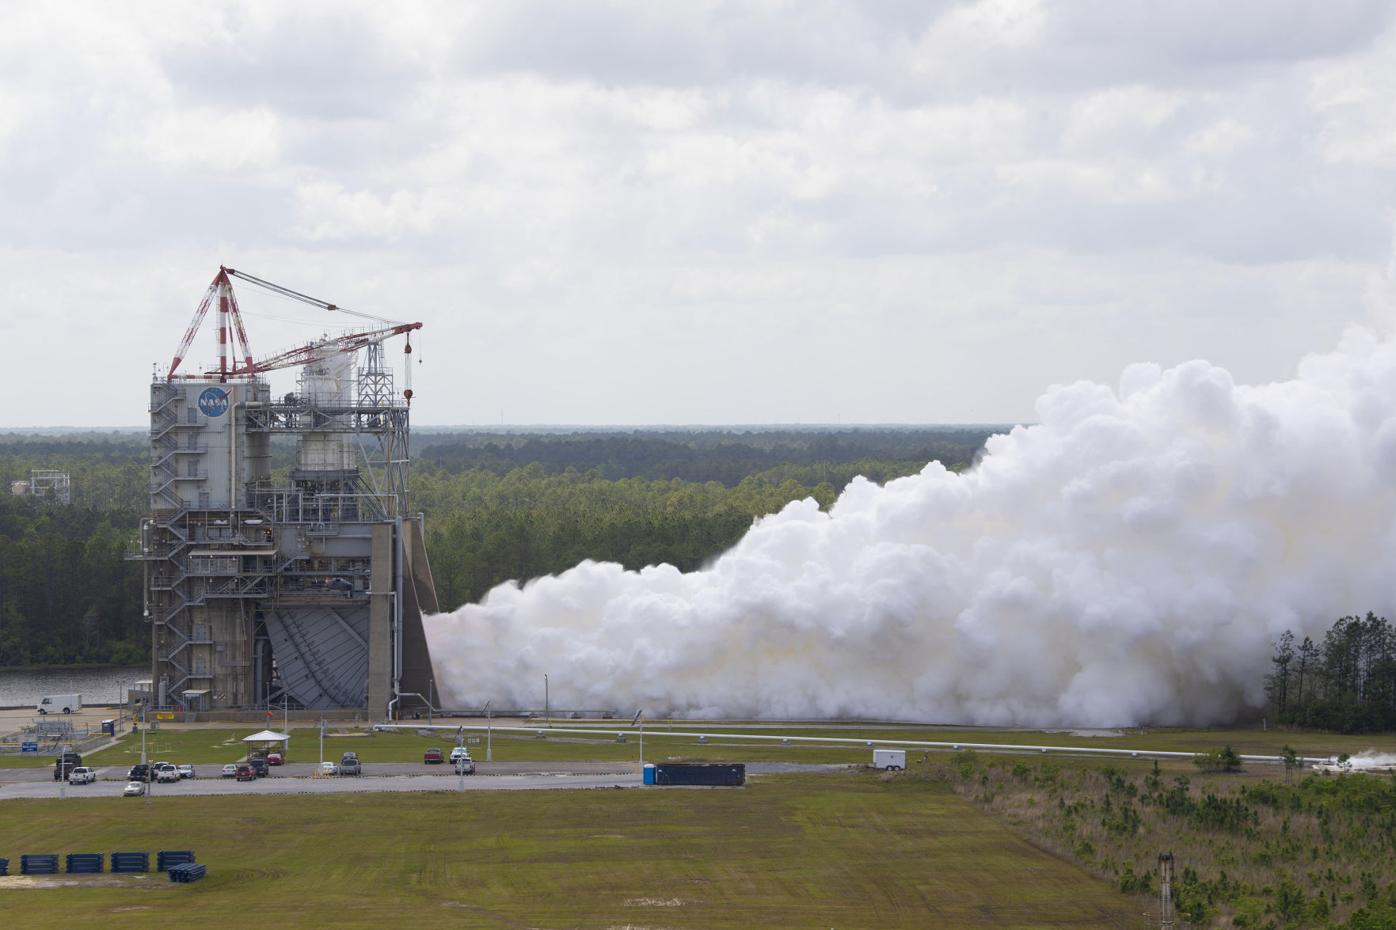 NASA ground test